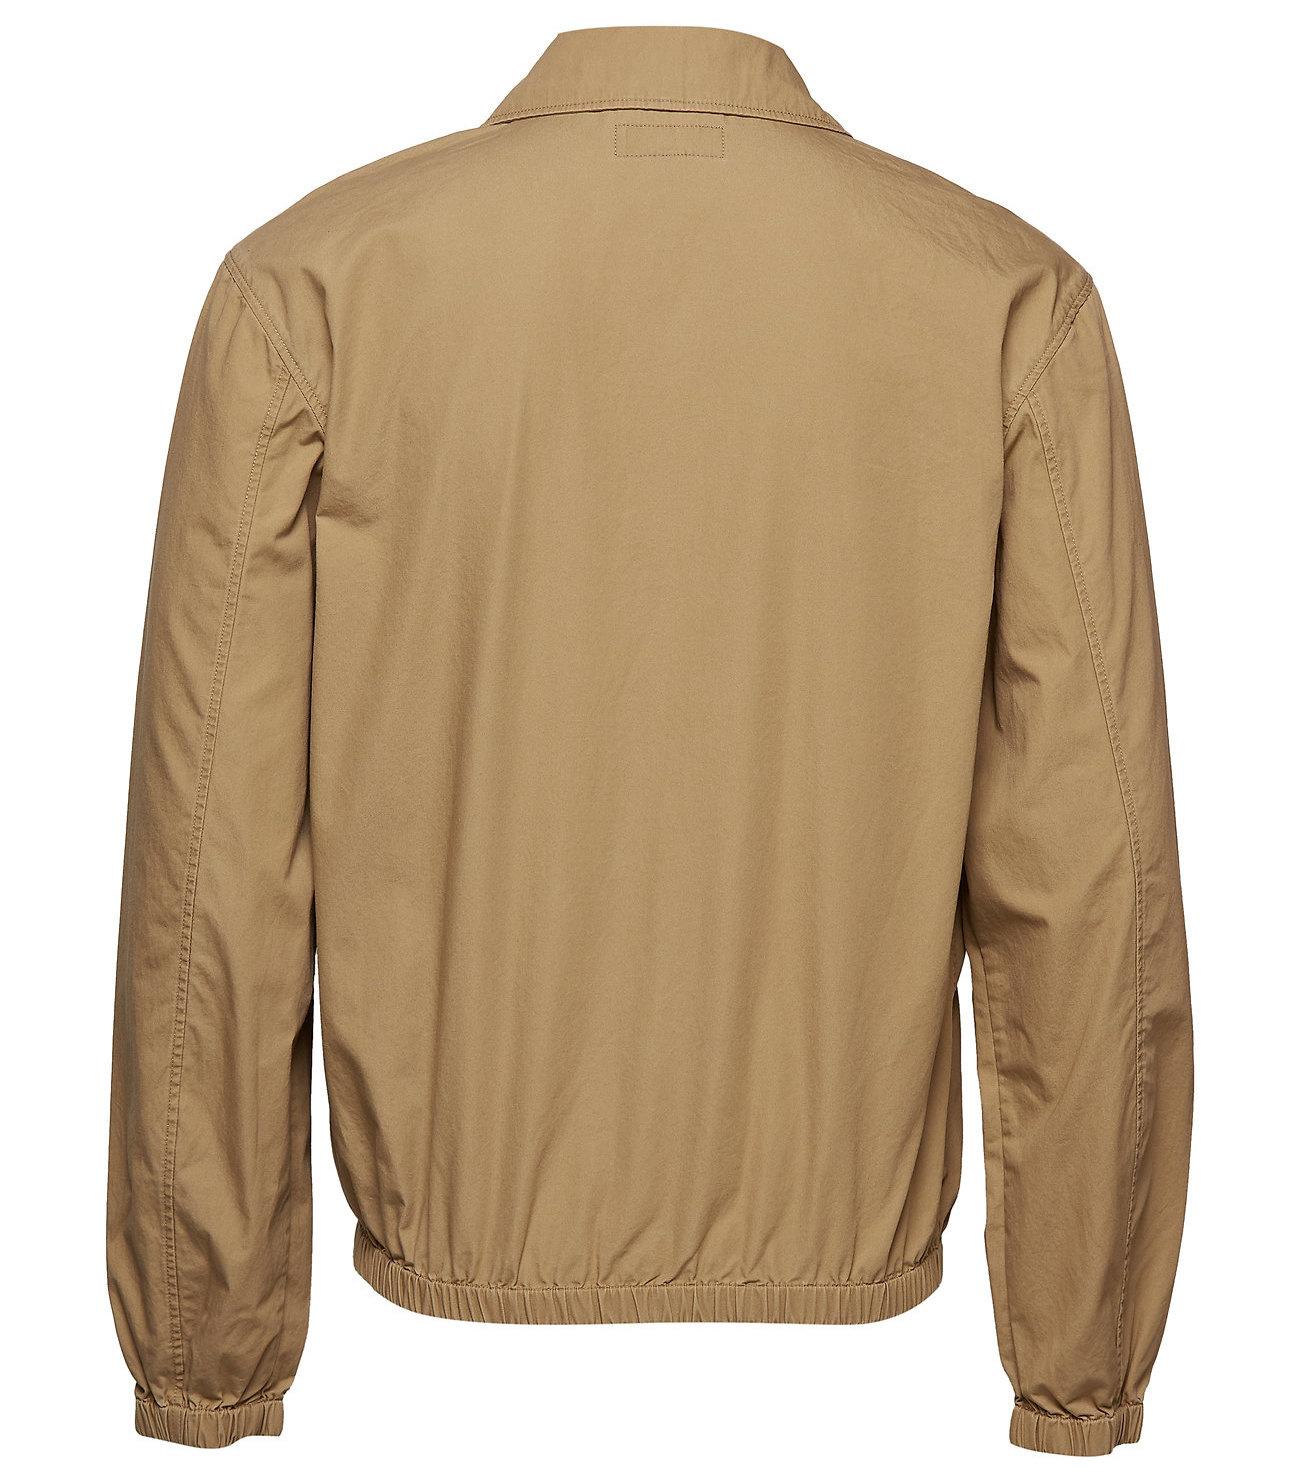 Polo Ralph Lauren Windbreaker jas, beige